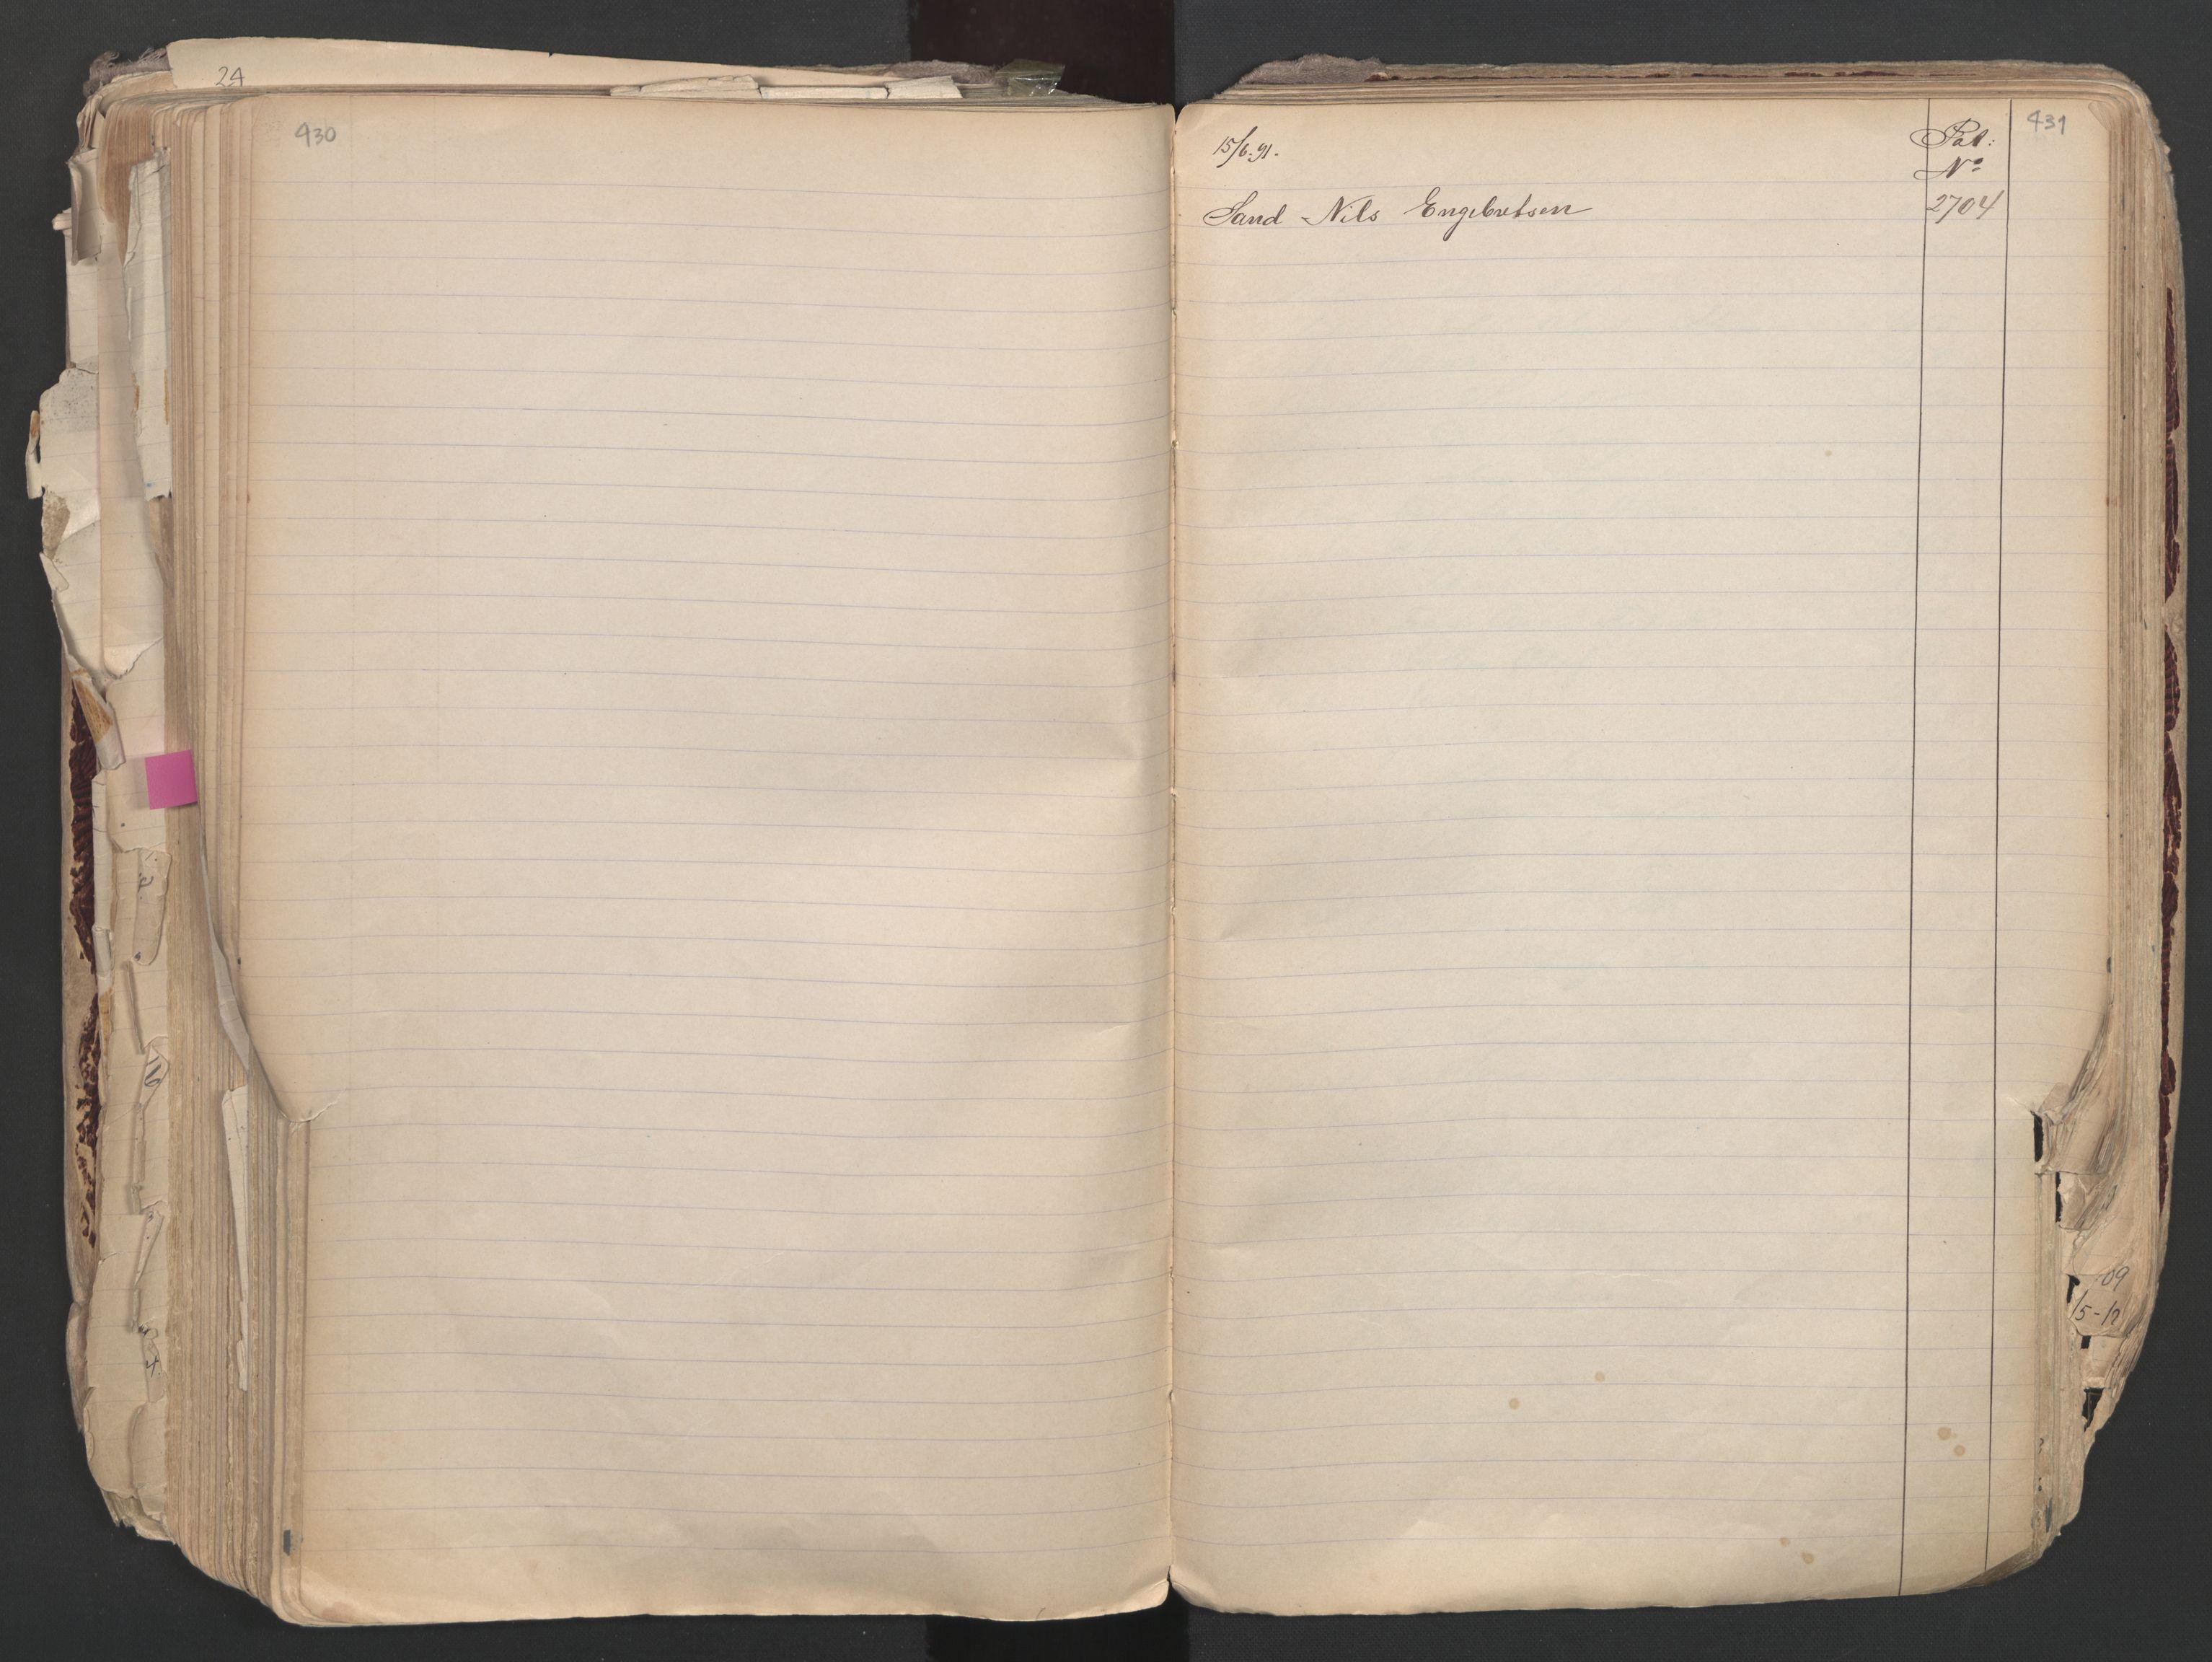 SAO, Oslo sjømannskontor, F/Fa/L0003: Register for Oslo mønstringskrets, 1891-1948, s. 430-431